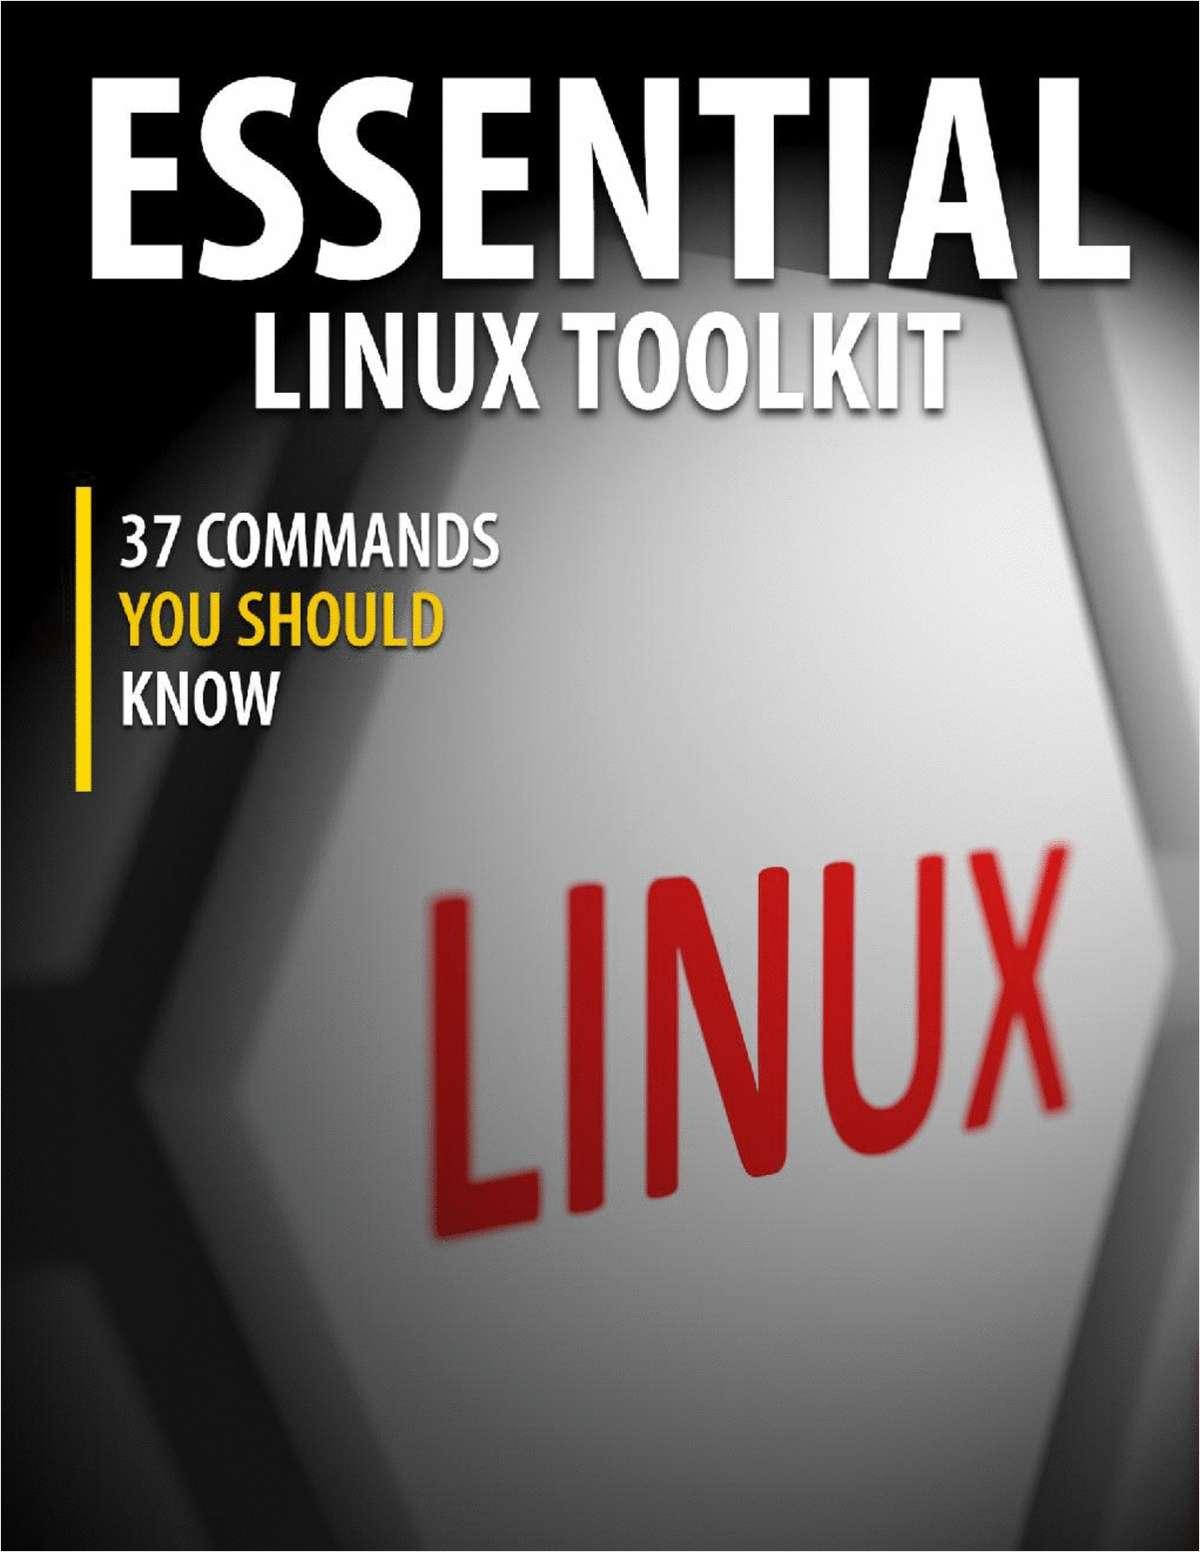 Essential Linux Toolkit